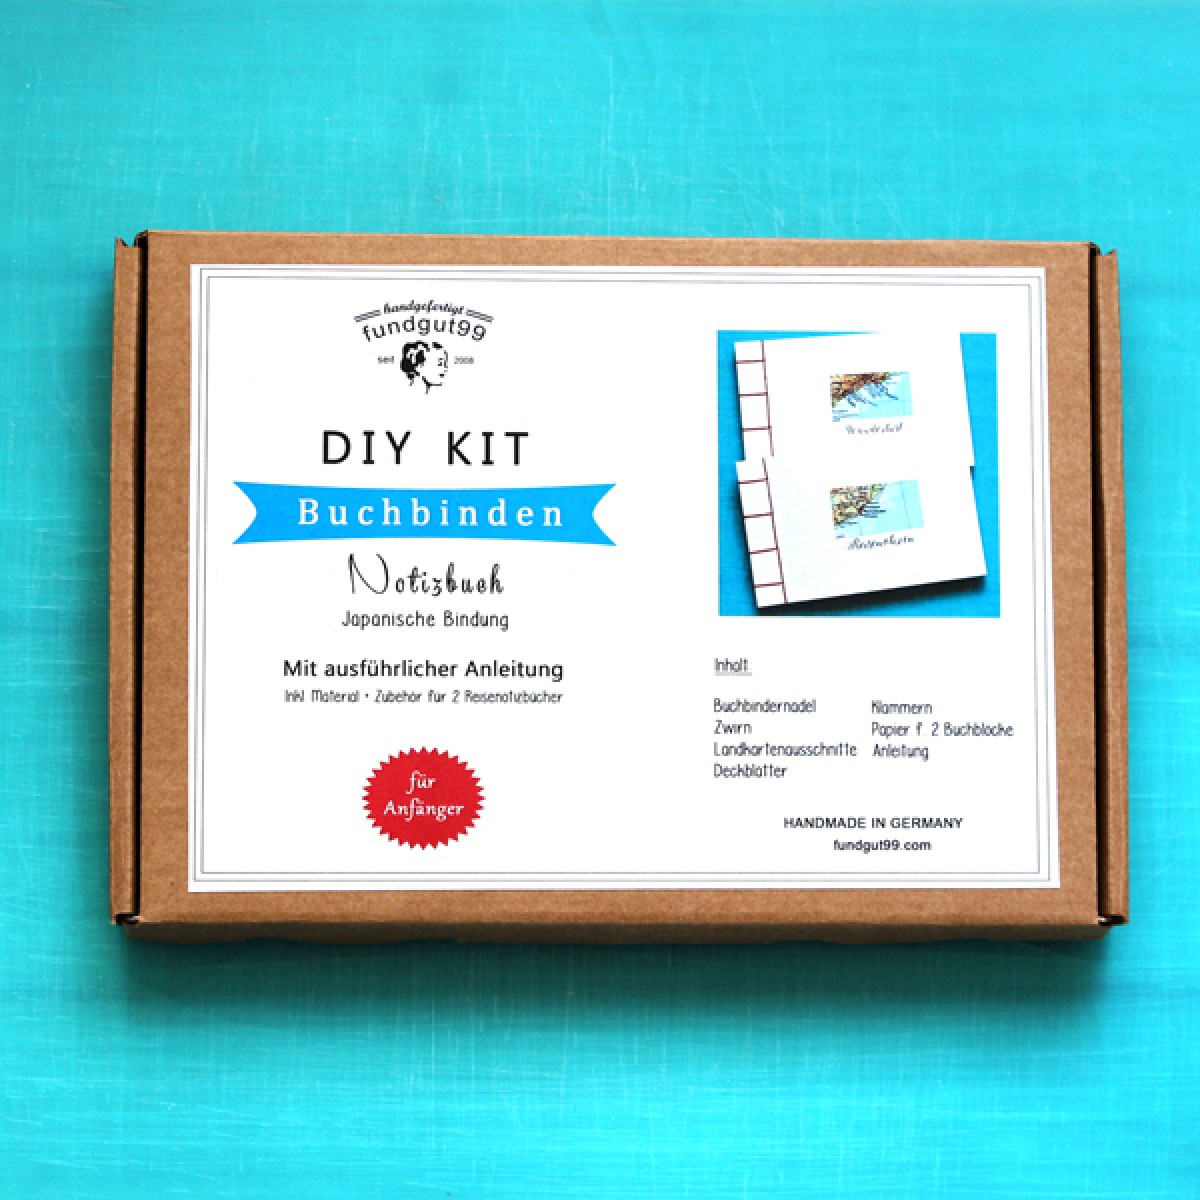 fundgut99 DIY Buchbinde Kit